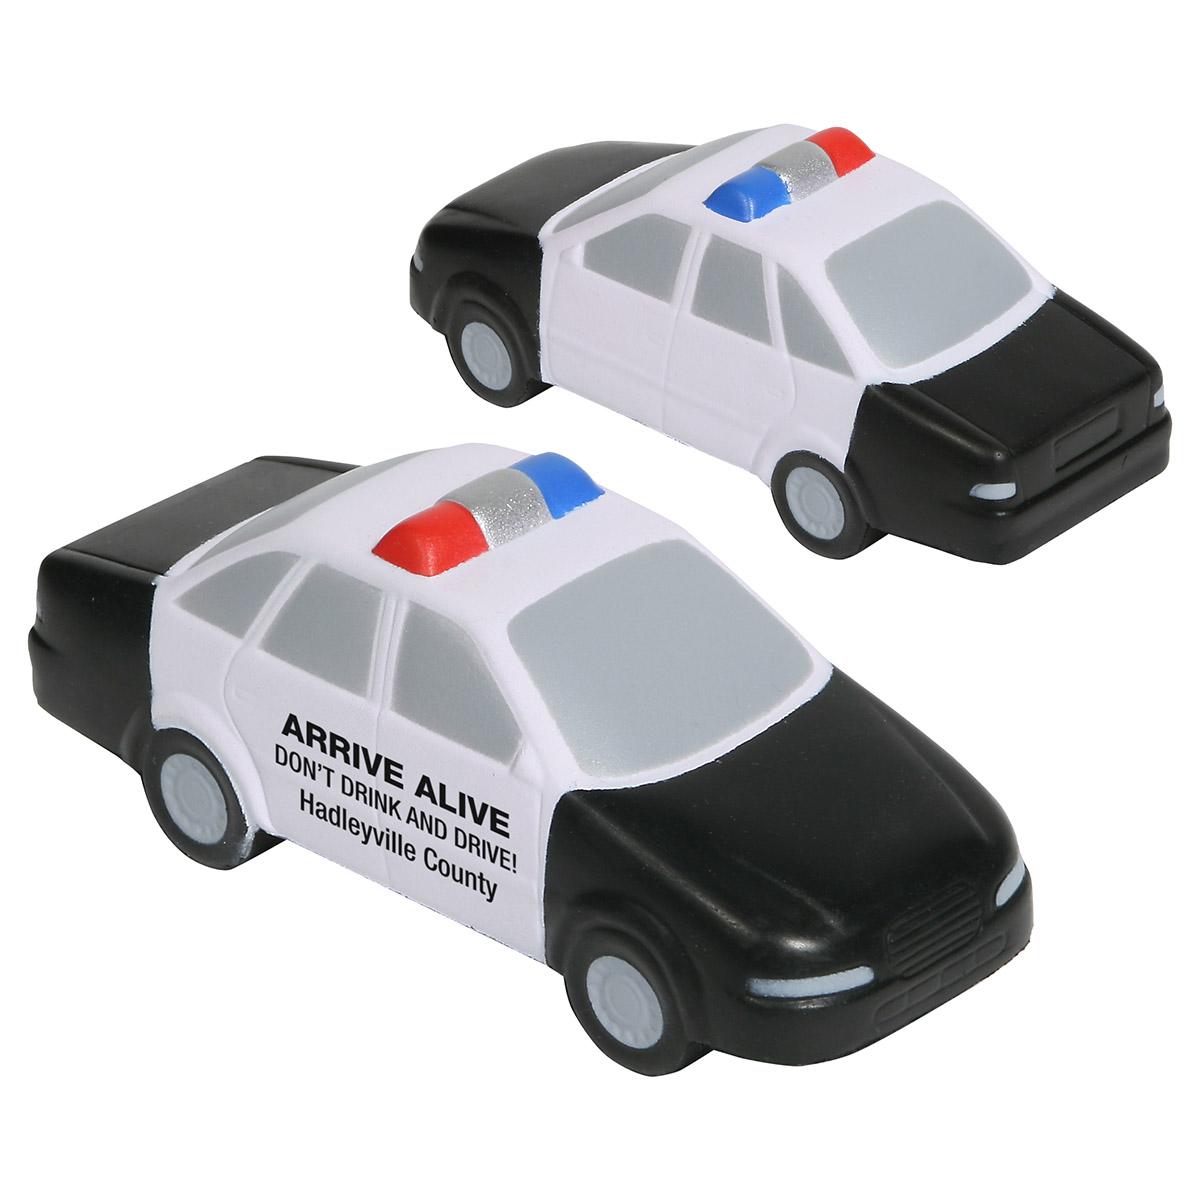 Police Car Stress Reliever, LCC-PC06 - 1 Colour Imprint